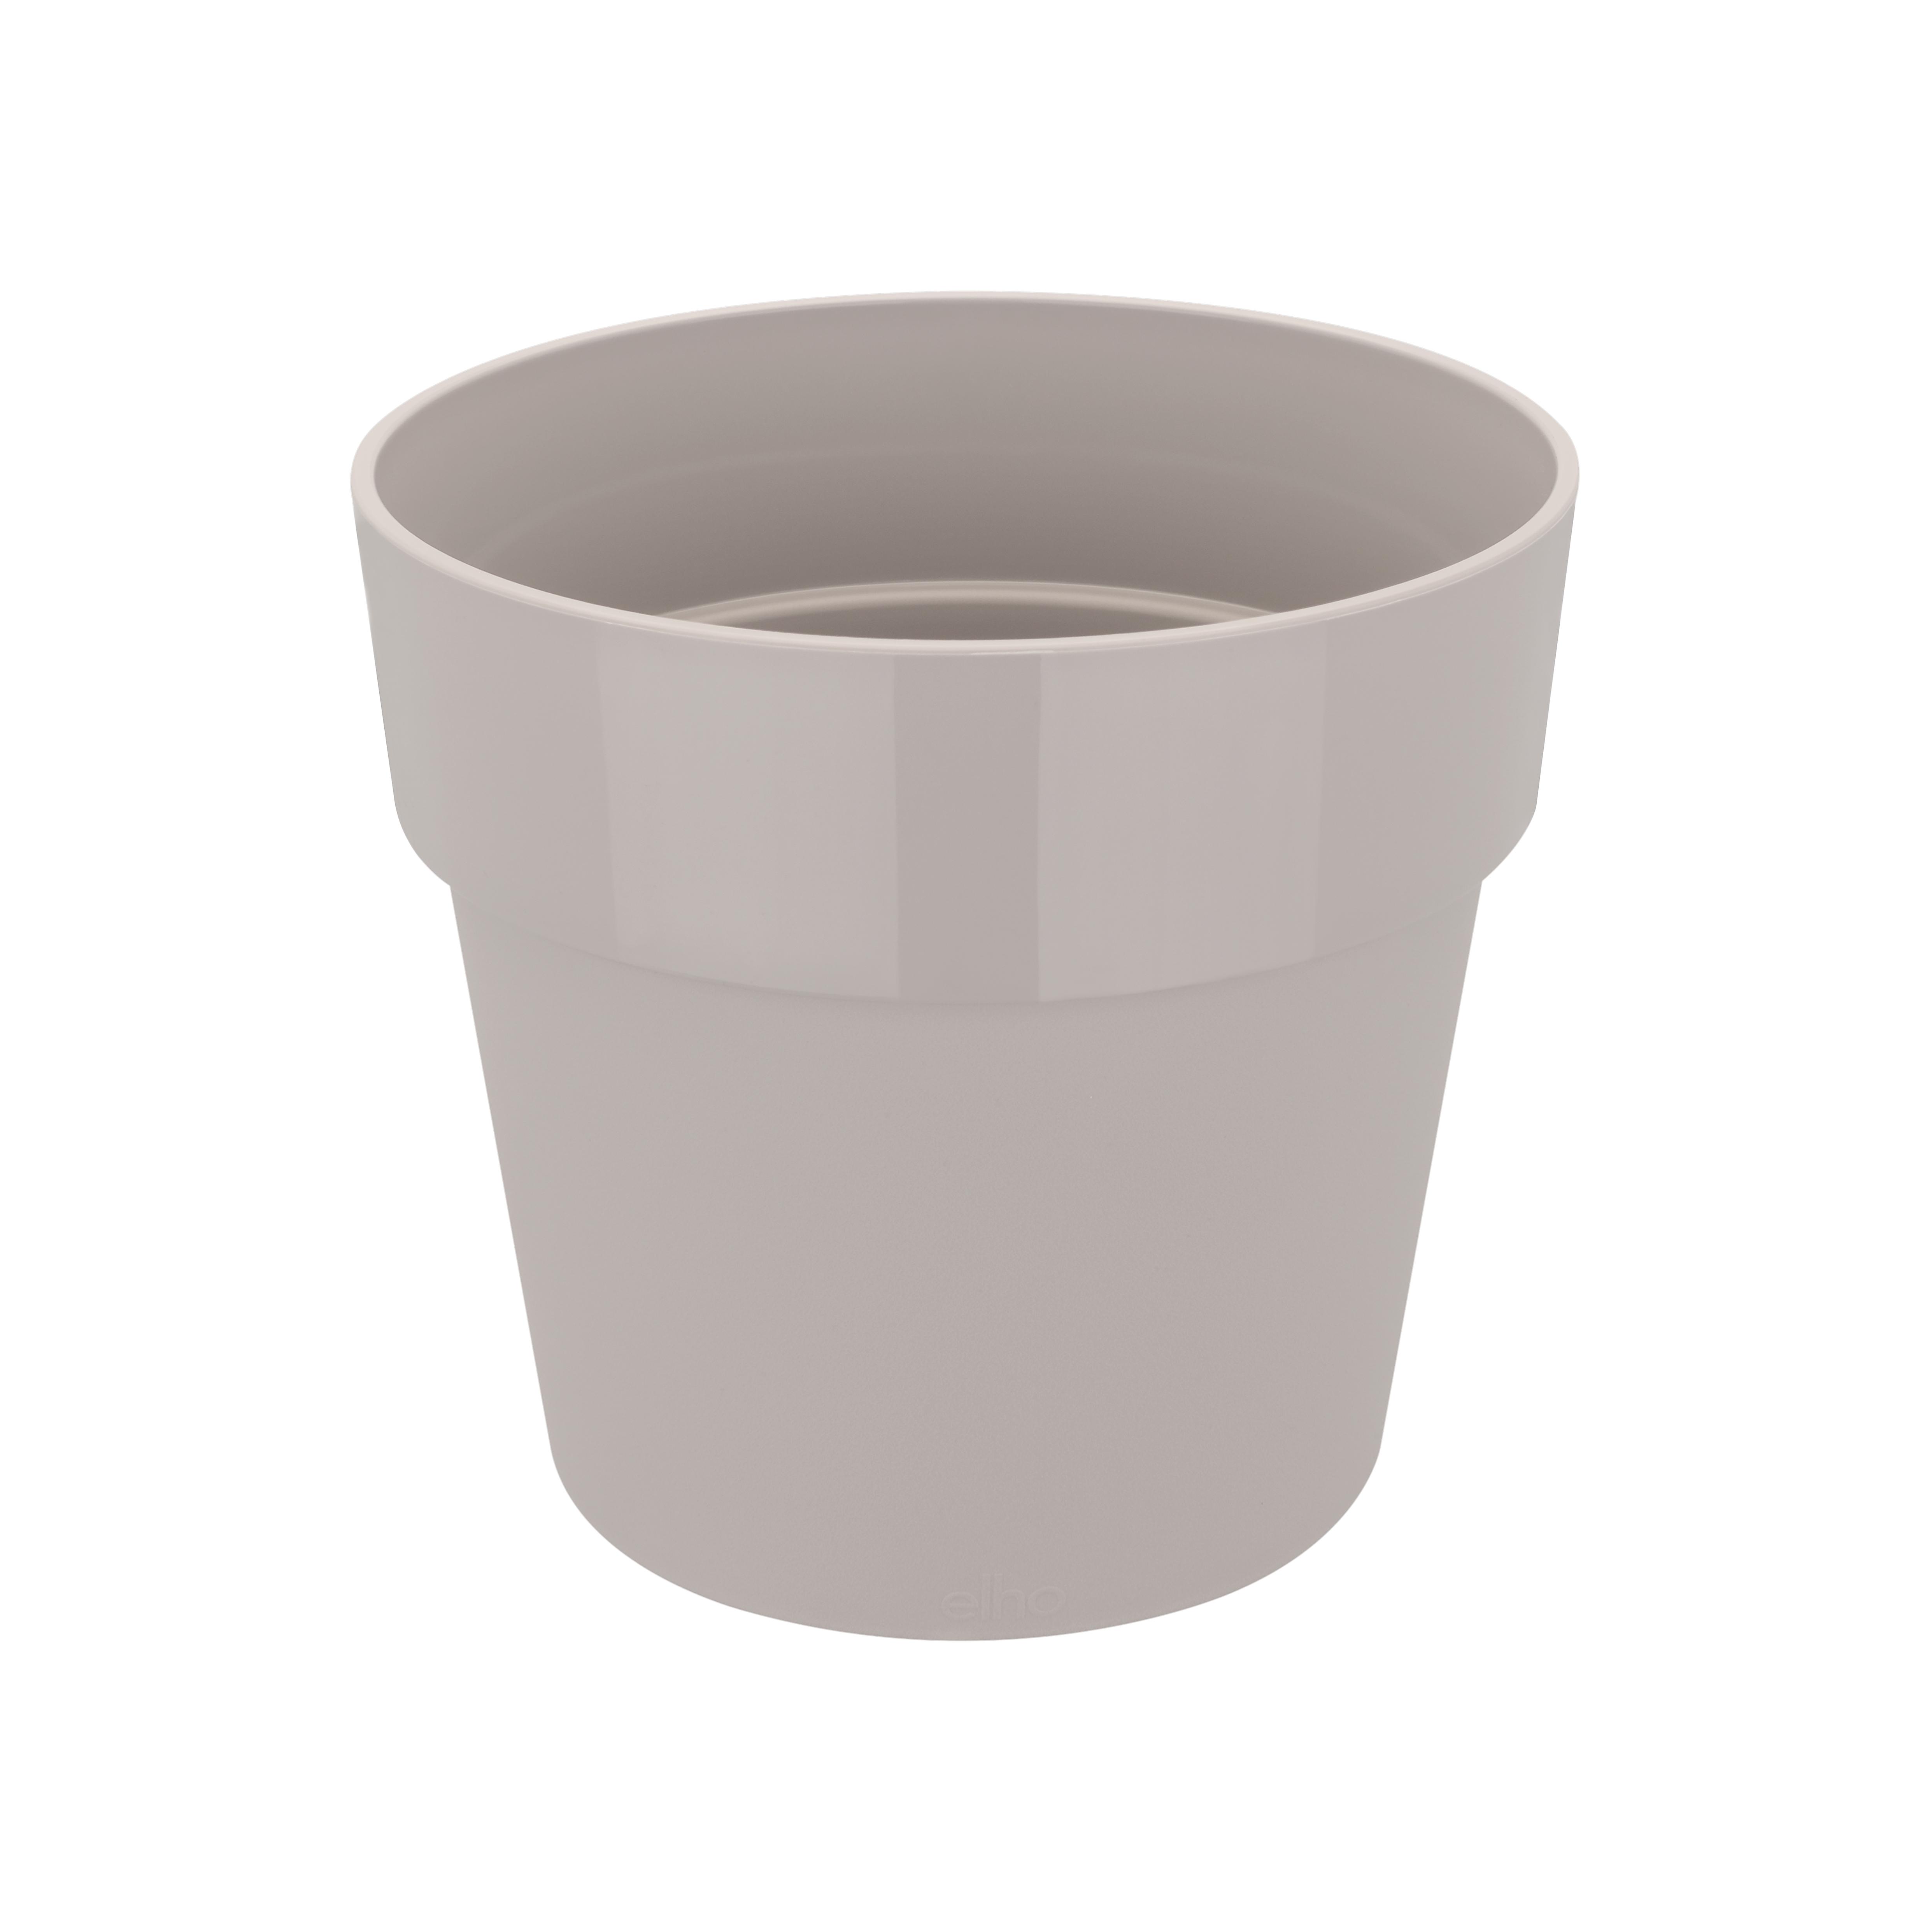 B.for original, Round, 16cm Warm Grey